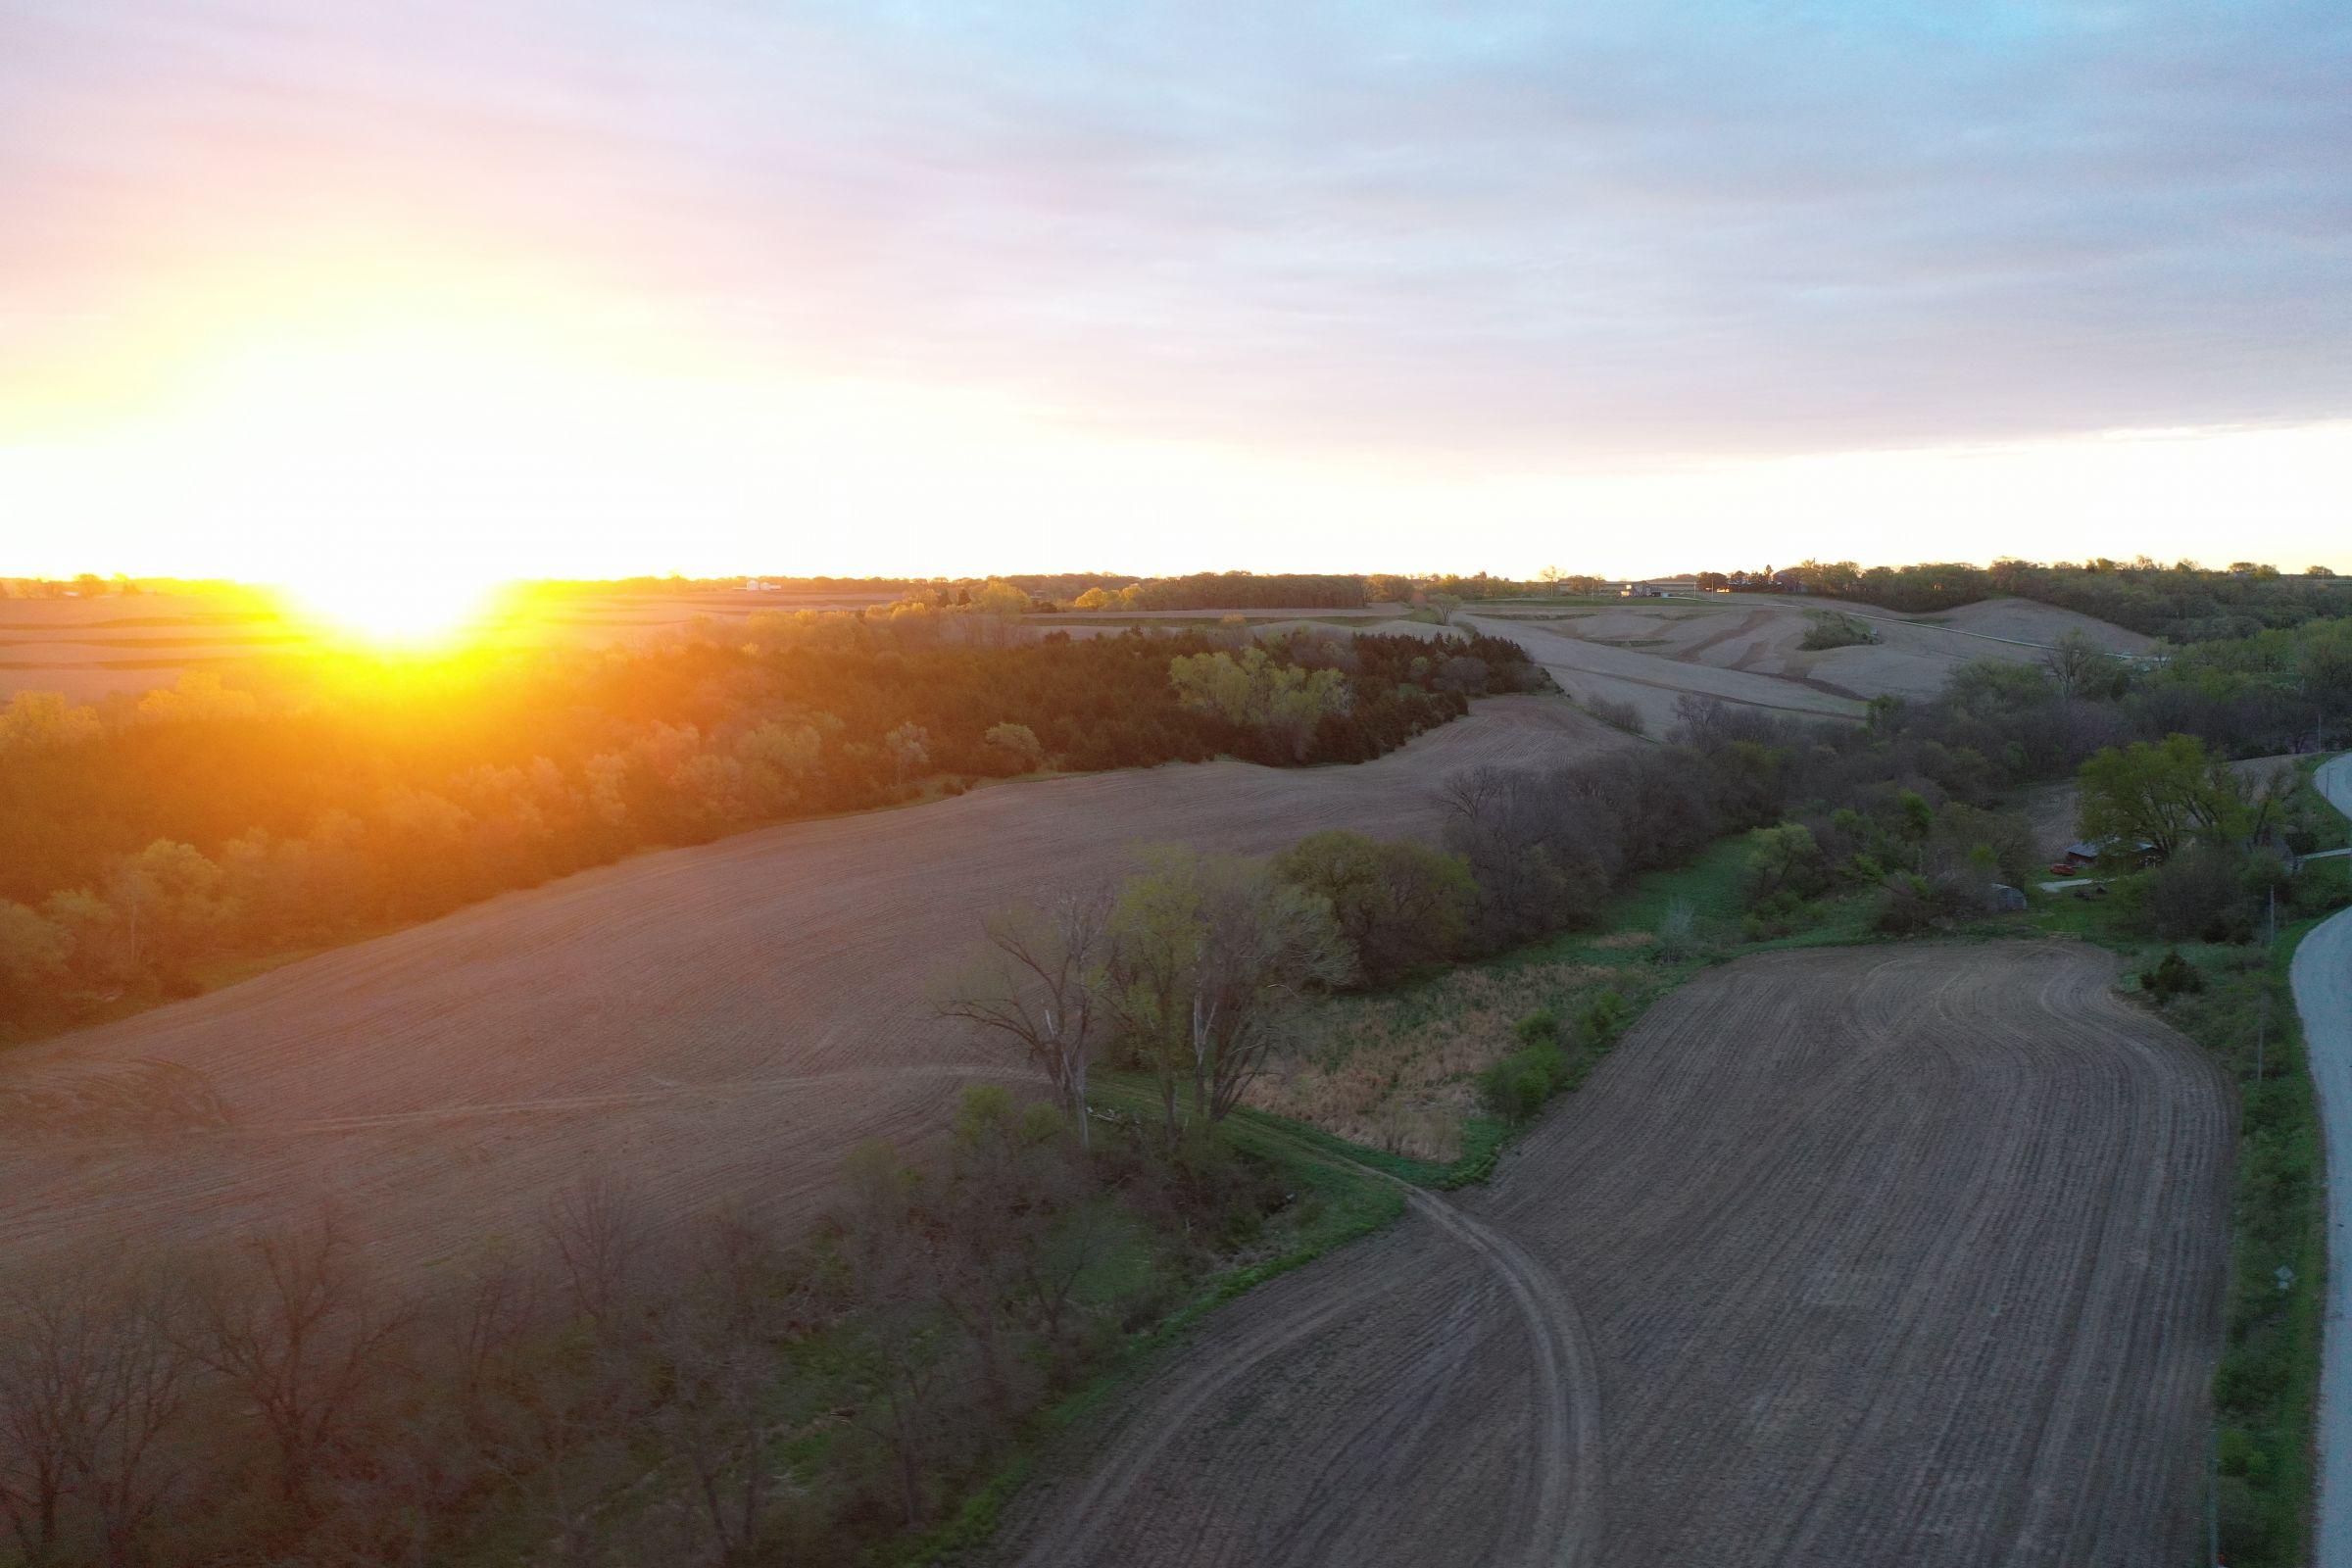 Pottawattamie County Iowa Recreational Land and Farmland For Sale